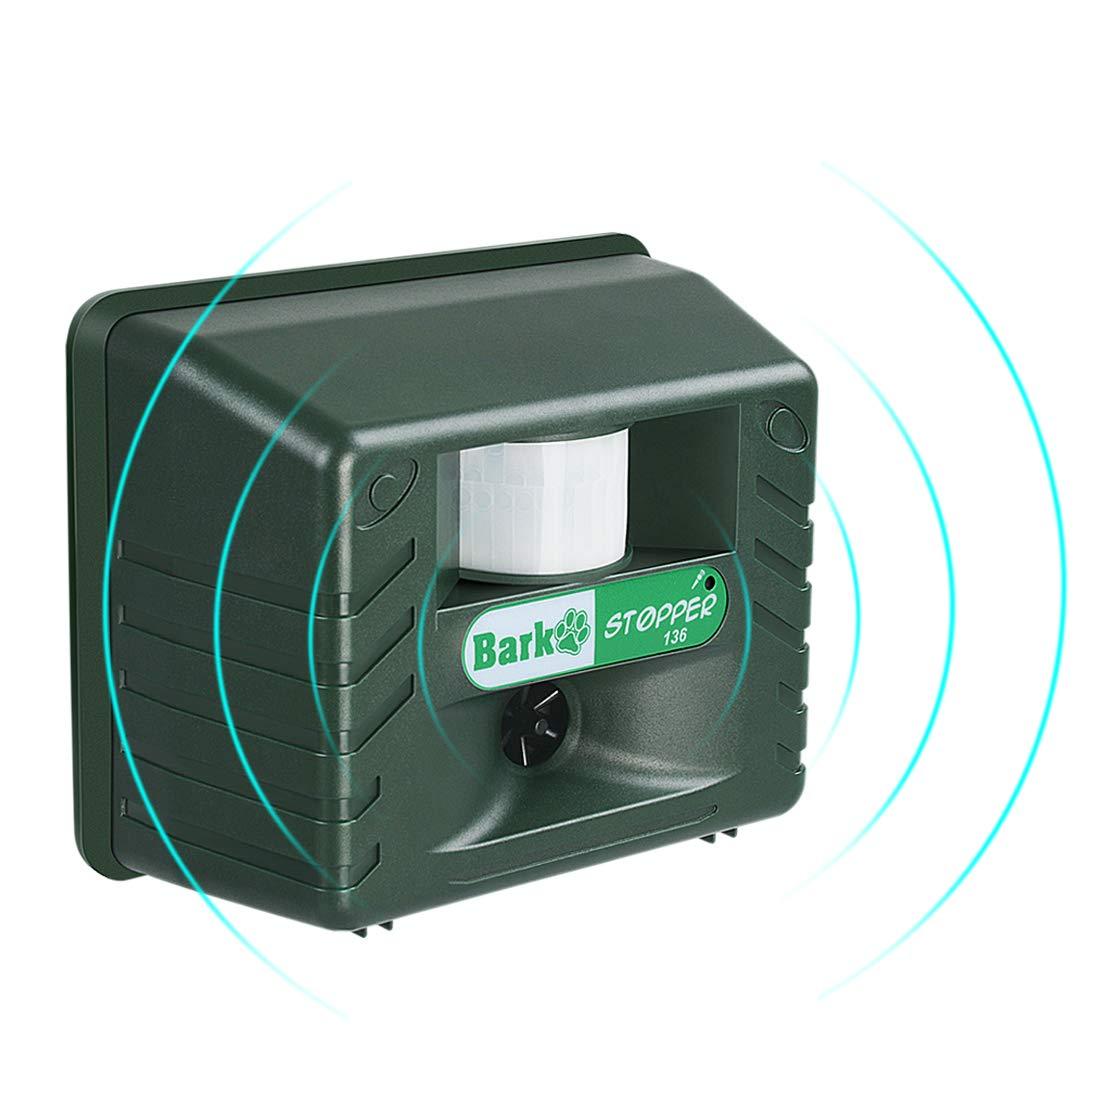 ADDTOP Ultrasonic Dog Repeller, Motion Sensor Animal Pest Dogs Repellent, Ultrasonic Sonic Dogs Bark Barking Control with Thermal Infrared Sentive